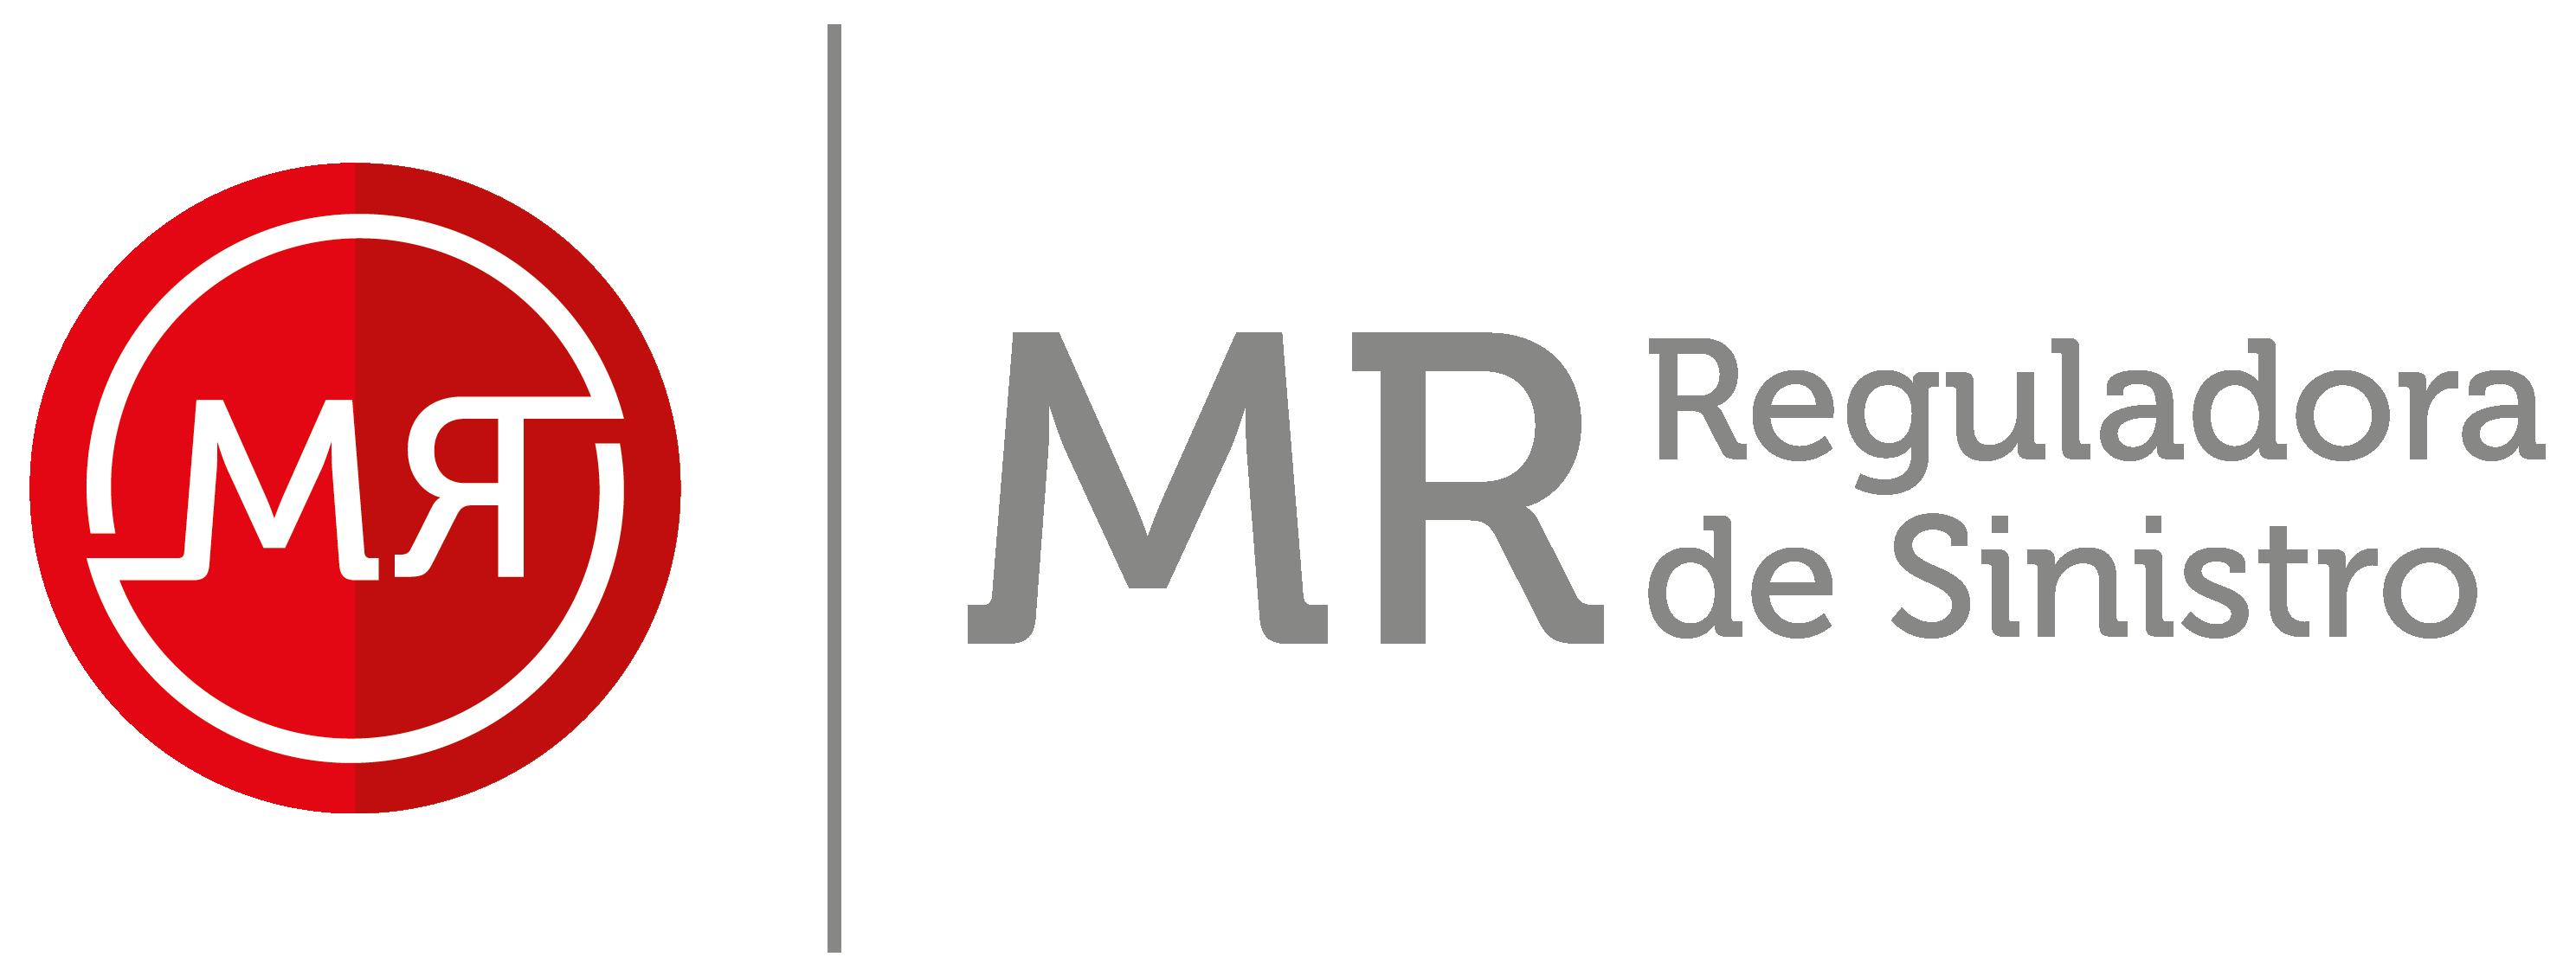 MR Reguladora De Sinistro